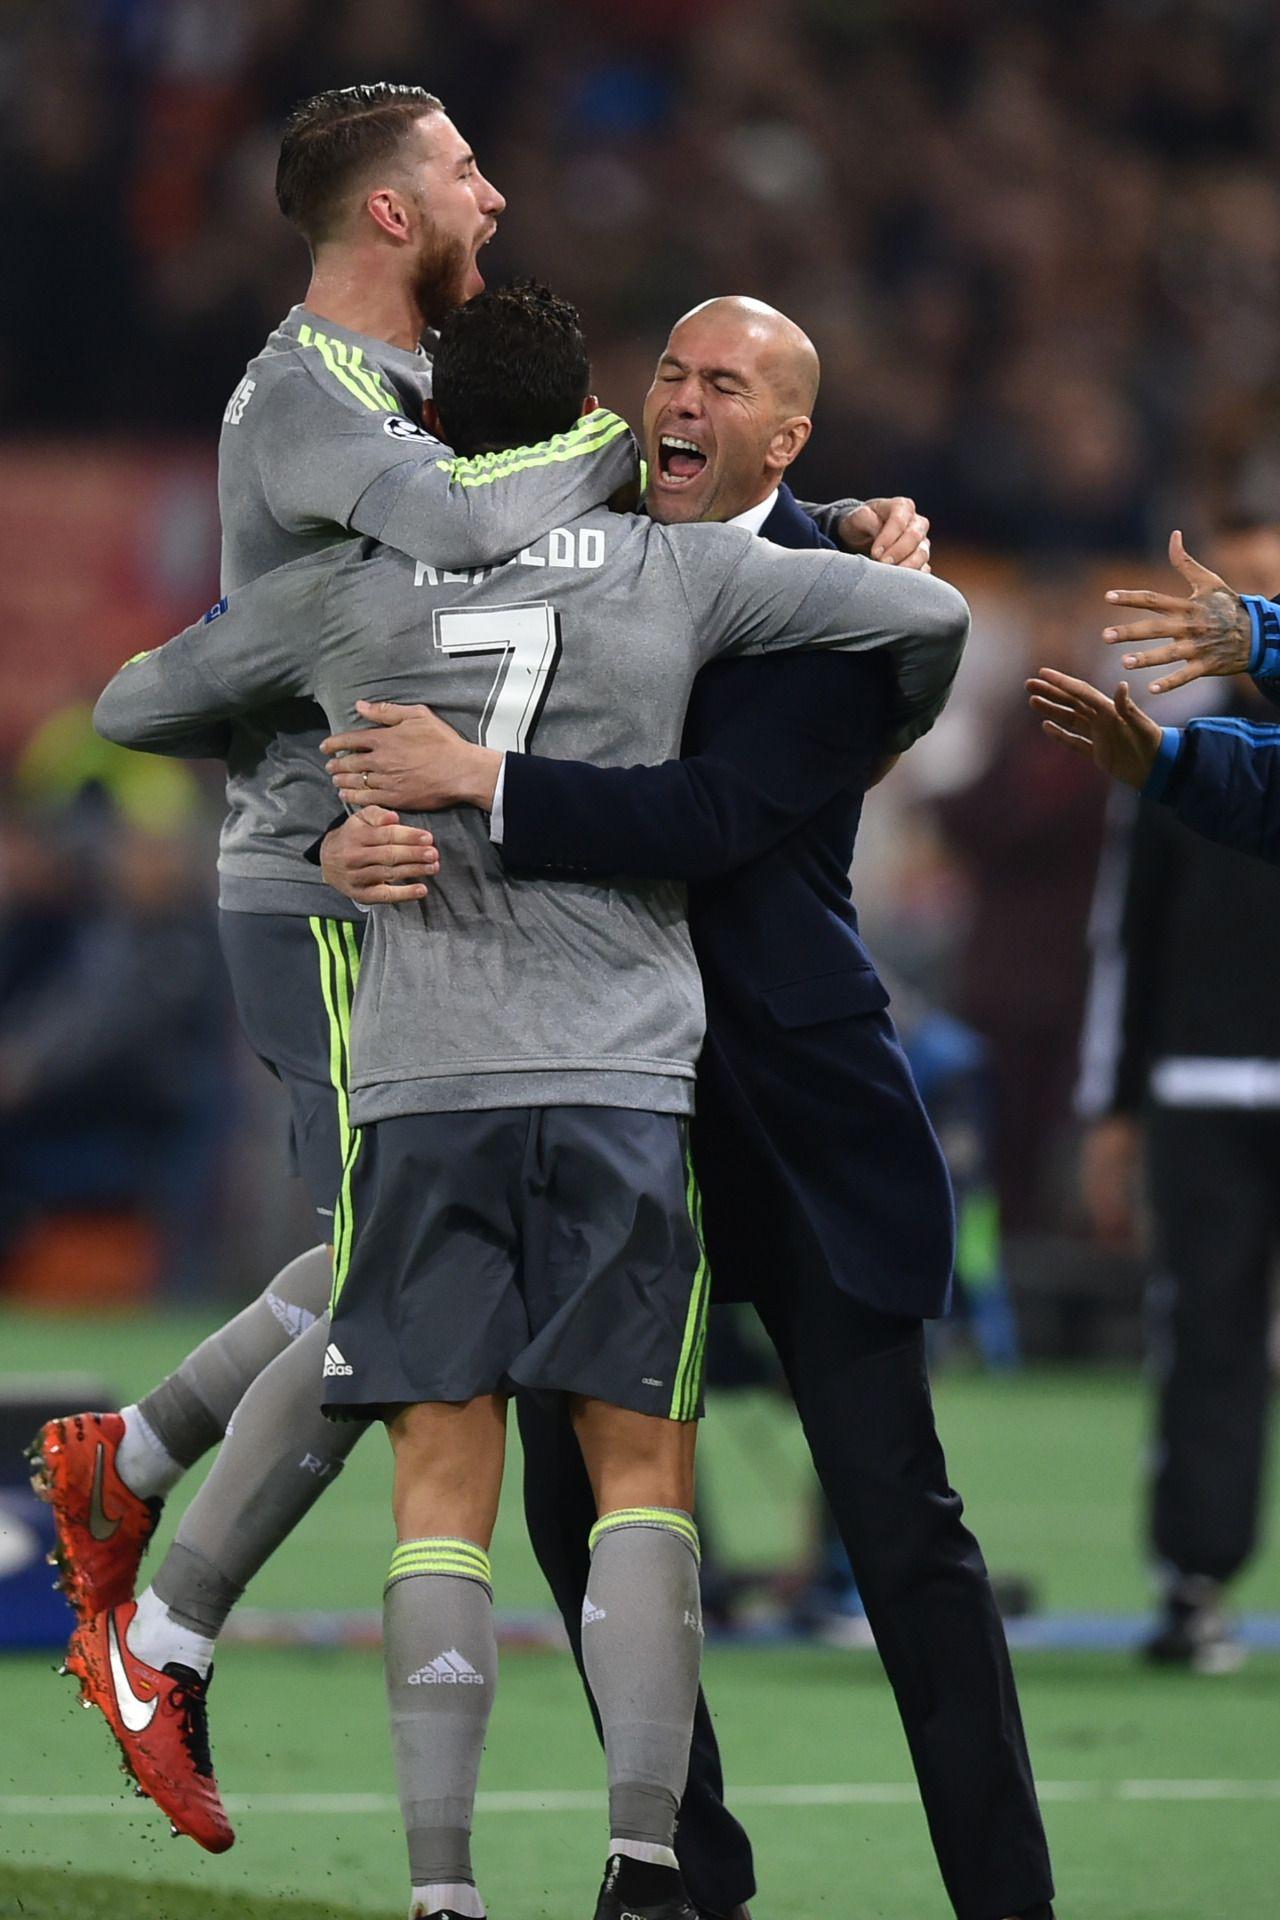 Ramos, Ronaldo, and Zidane celebrate Cristiano's goal.